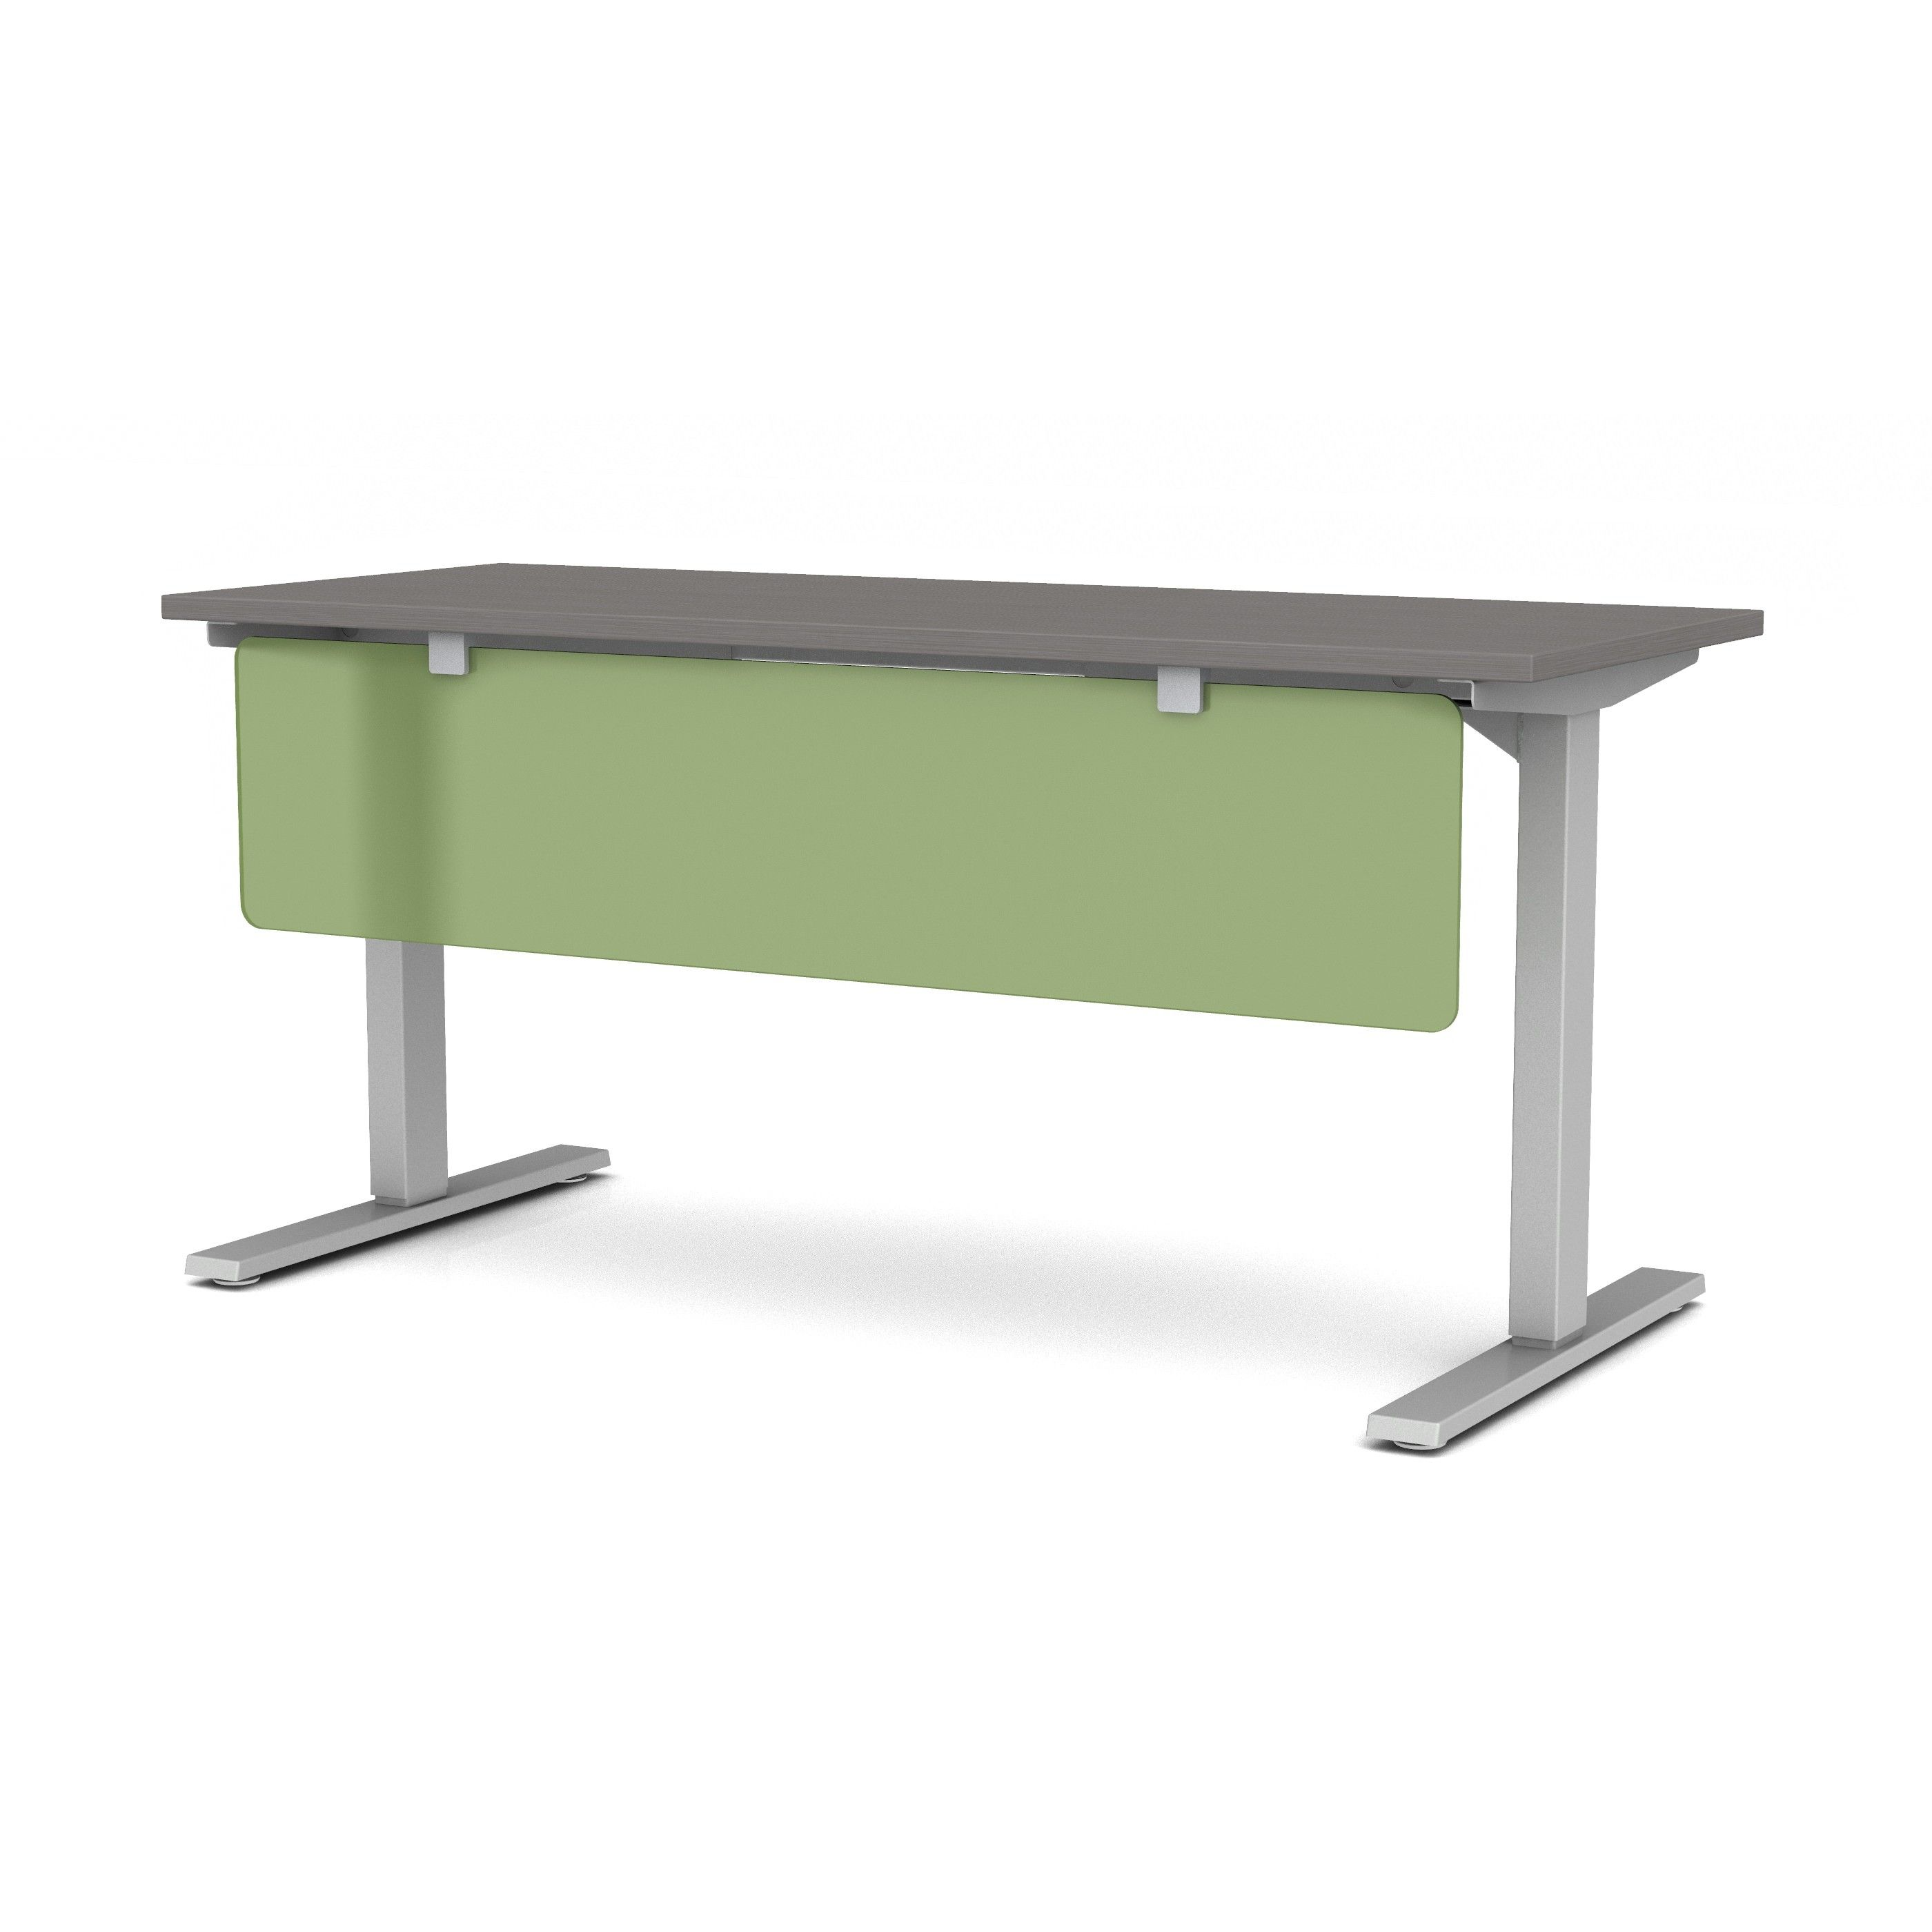 Workspace Modesty Panels Custom Desk Modesty Panels Desk Privacy Custom Desk Desk Dividers Desk Partitions